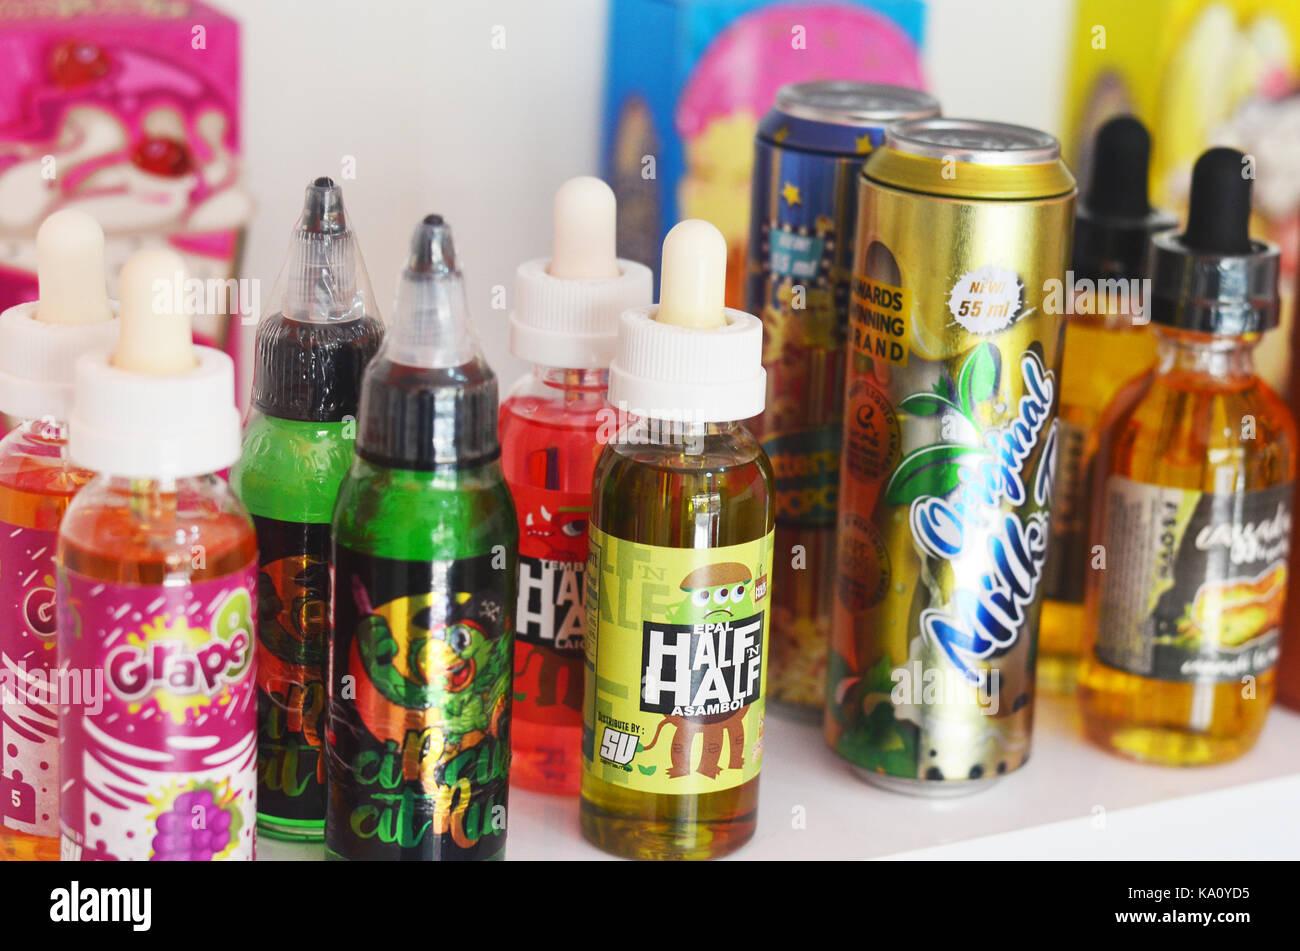 vape liquid and tools - Stock Image